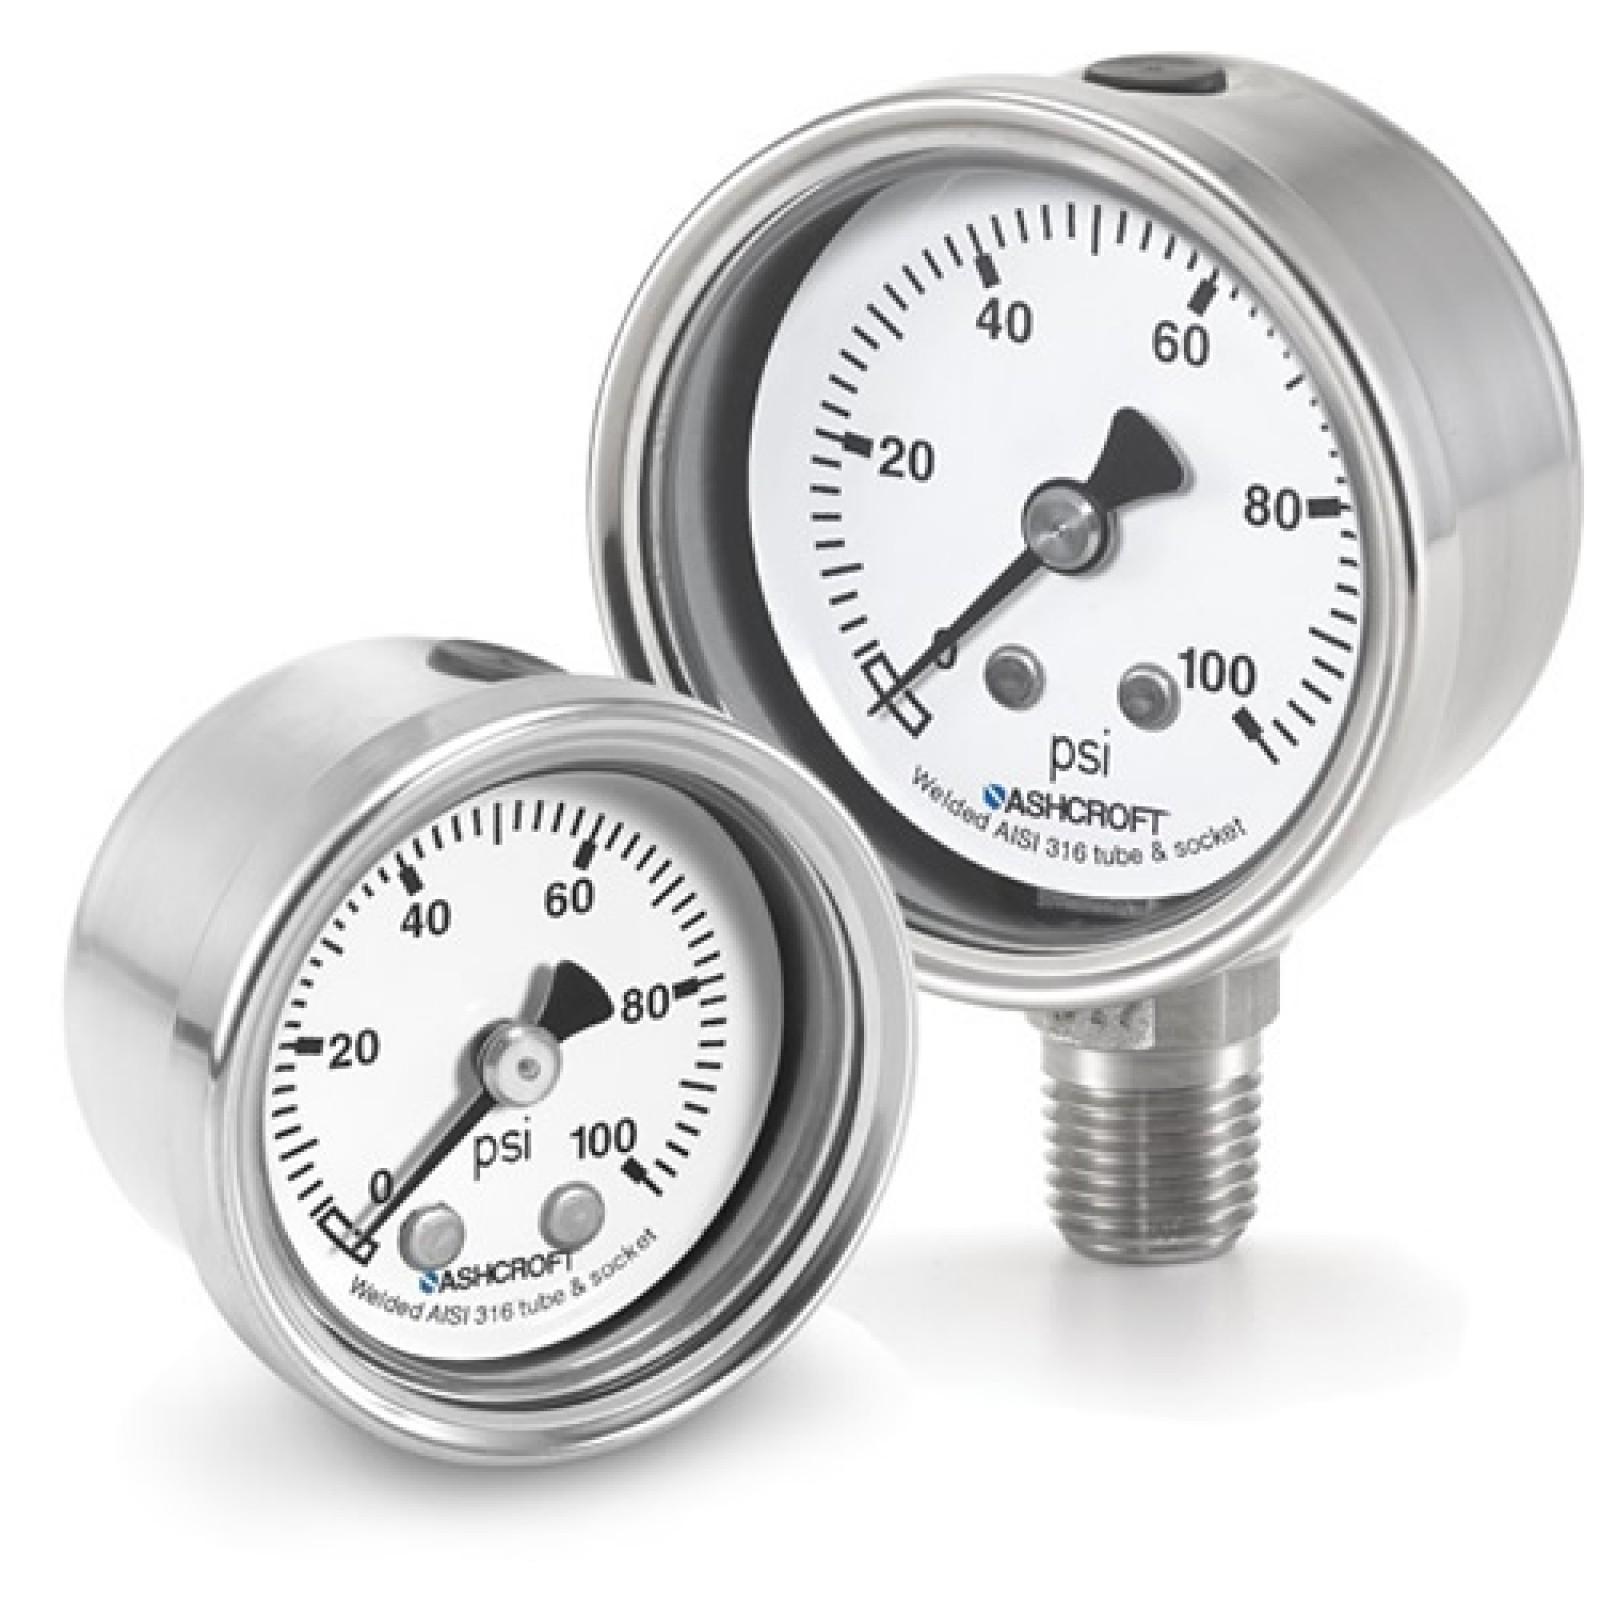 "63 1008S 02L 15000#/KP - Pressure Gauge, 63mm stainless 1/4"" NPT Lower conn & Case, 0/15,000 psi"